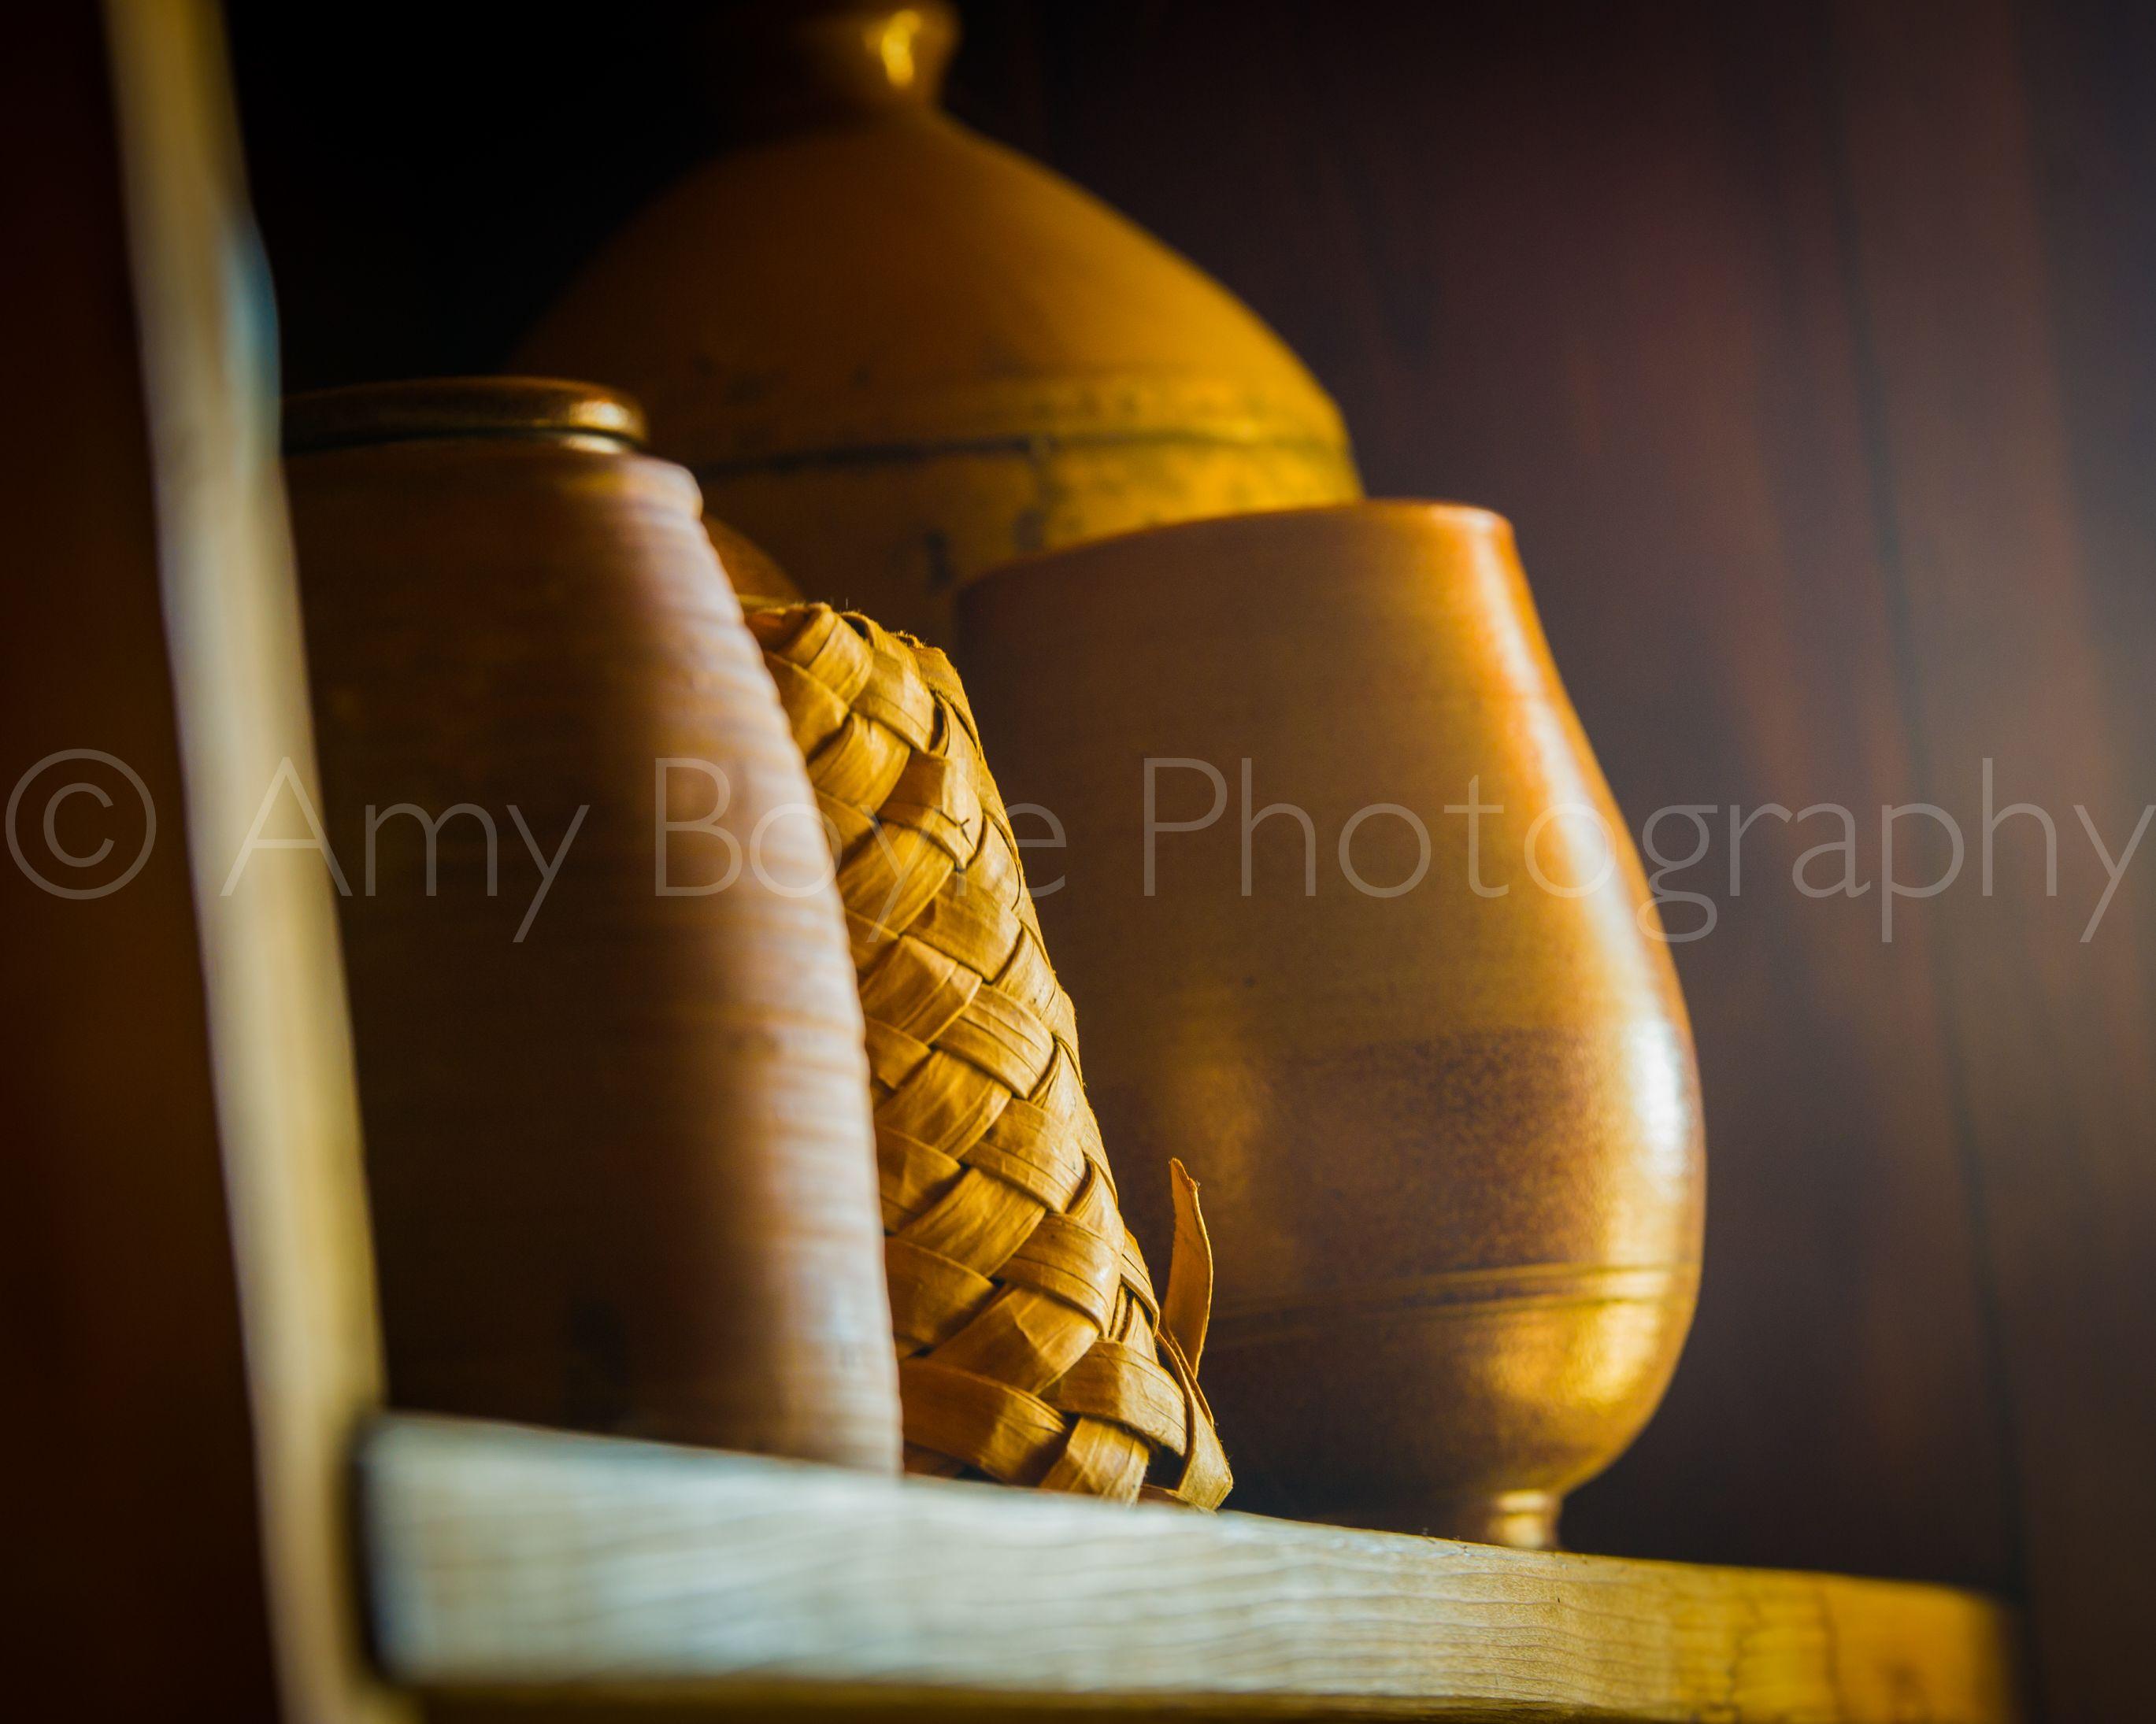 ©Amy Boyle Photography